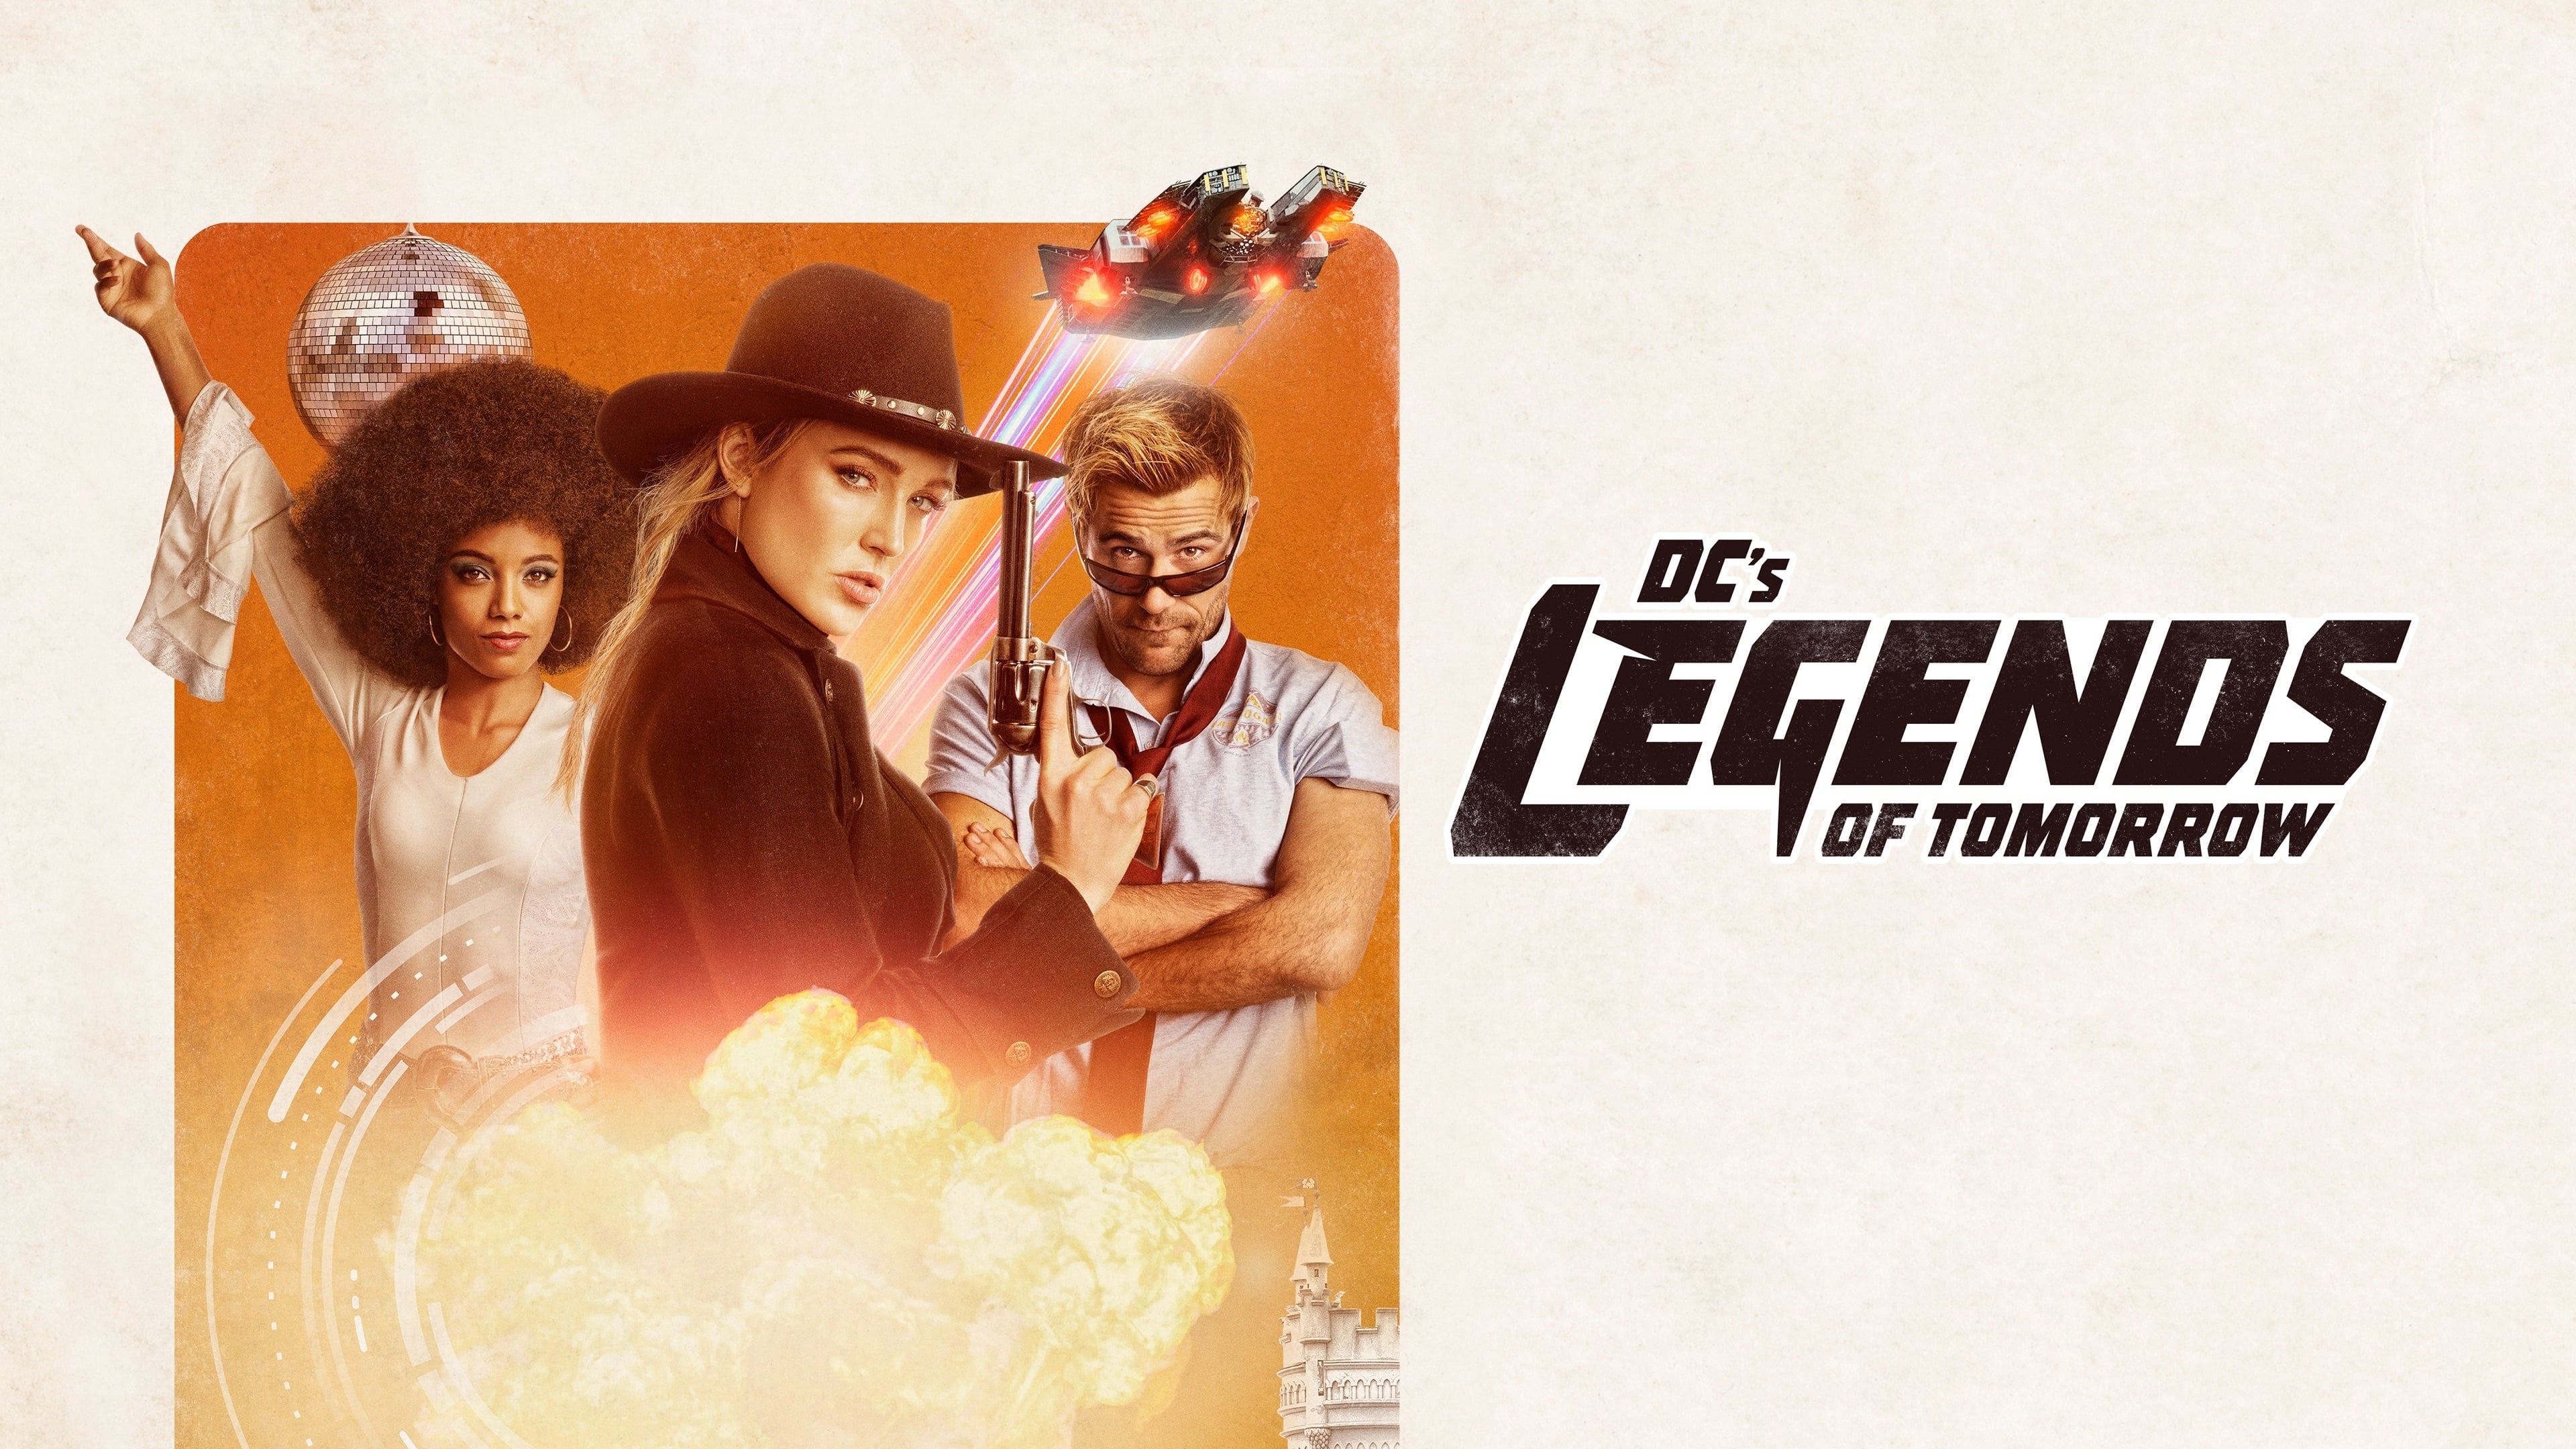 DC's Legends of Tomorrow - Season 2